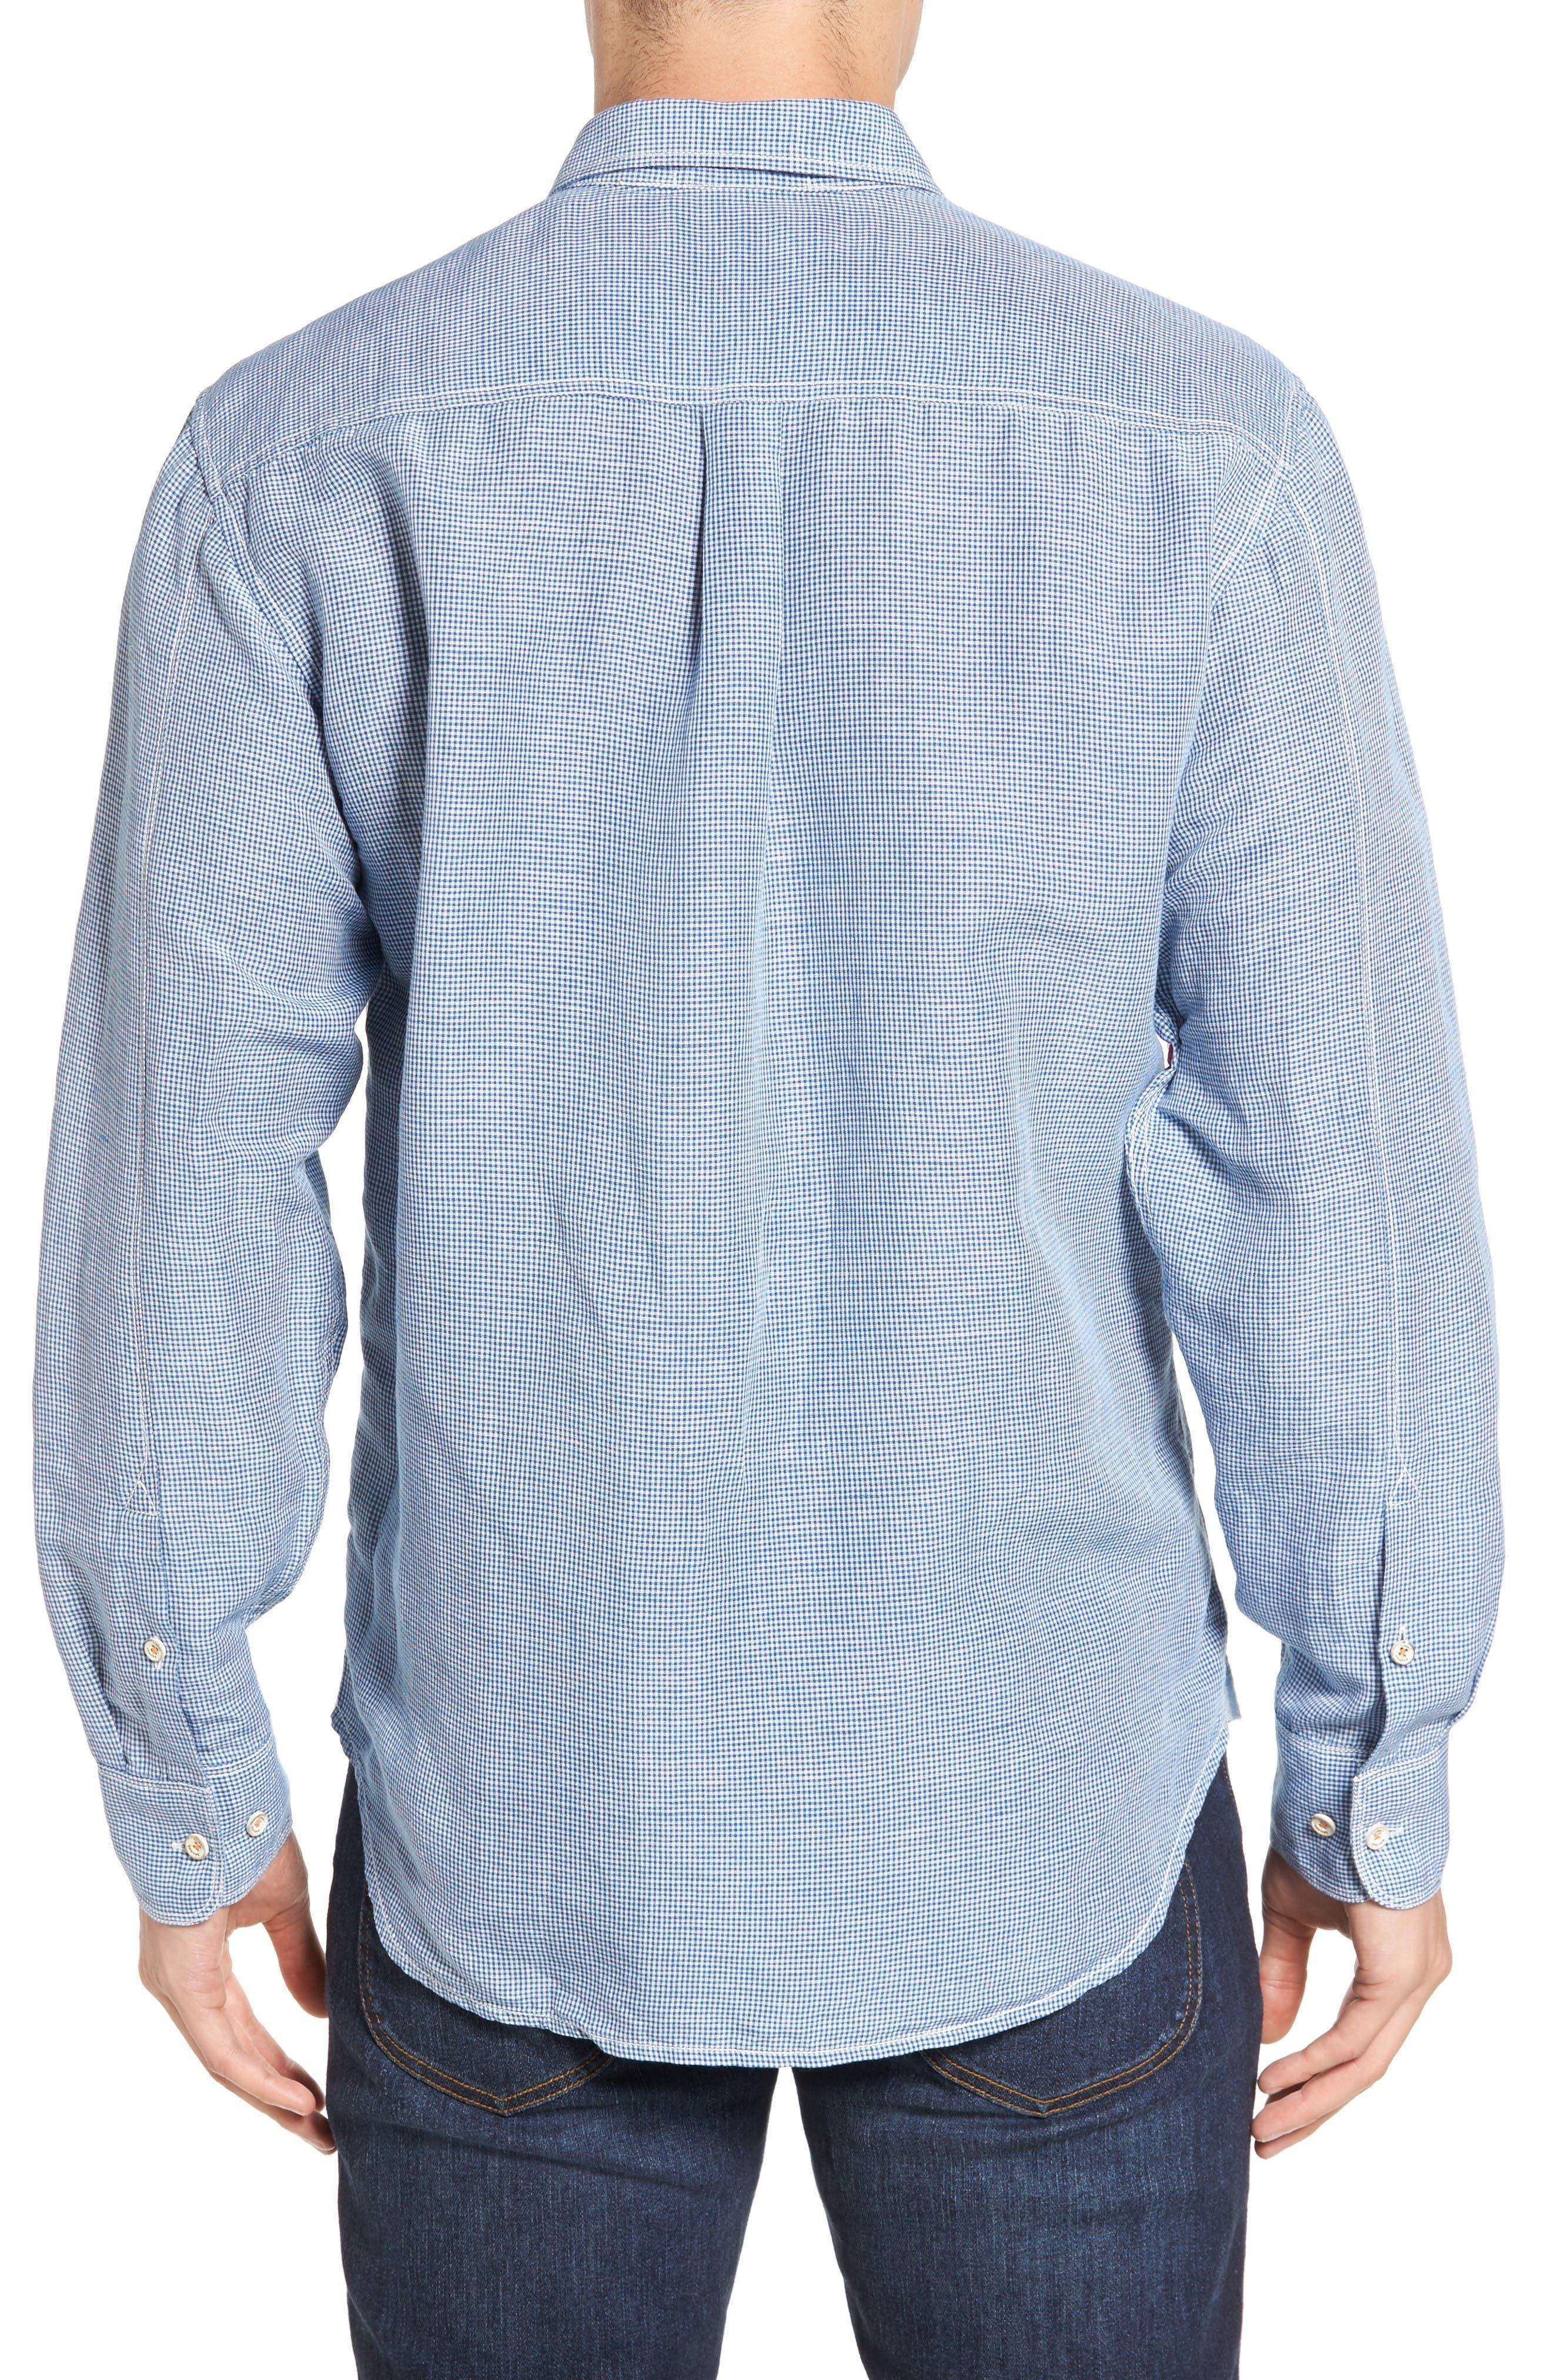 Alternate Image 2  - Tommy Bahama Sand Linen Island Modern Fit Sport Shirt